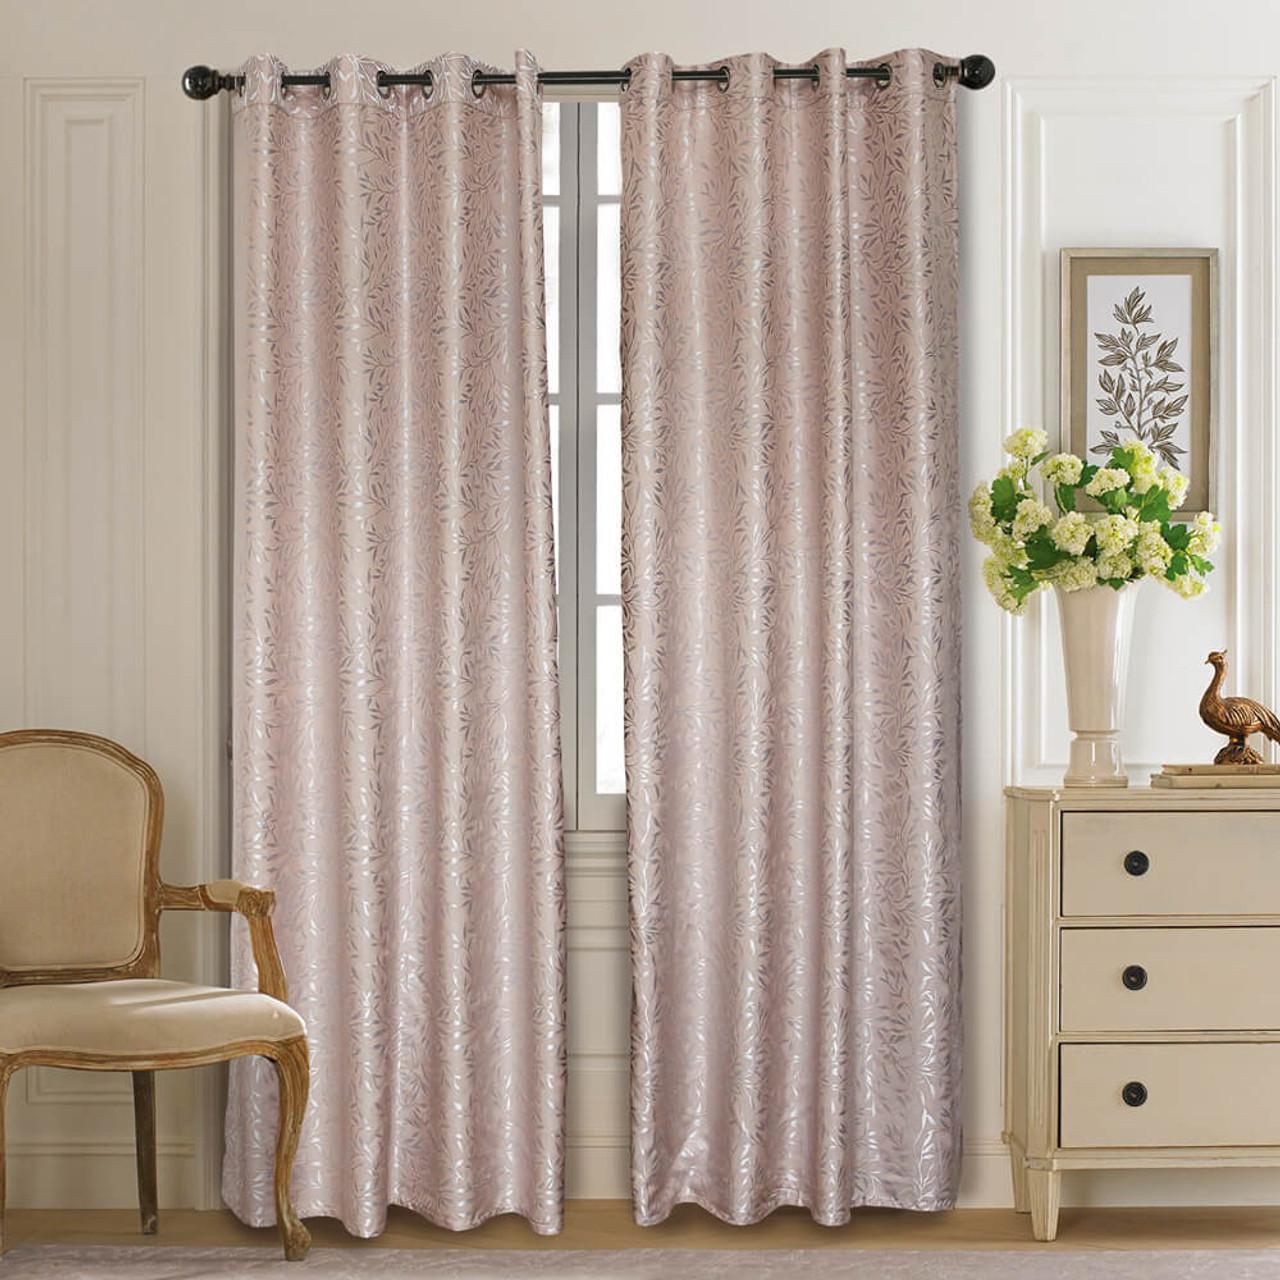 Curtain Panel Semi-Blackout Drapes, DMC713 Dolce Mela Olympia Window Treatments